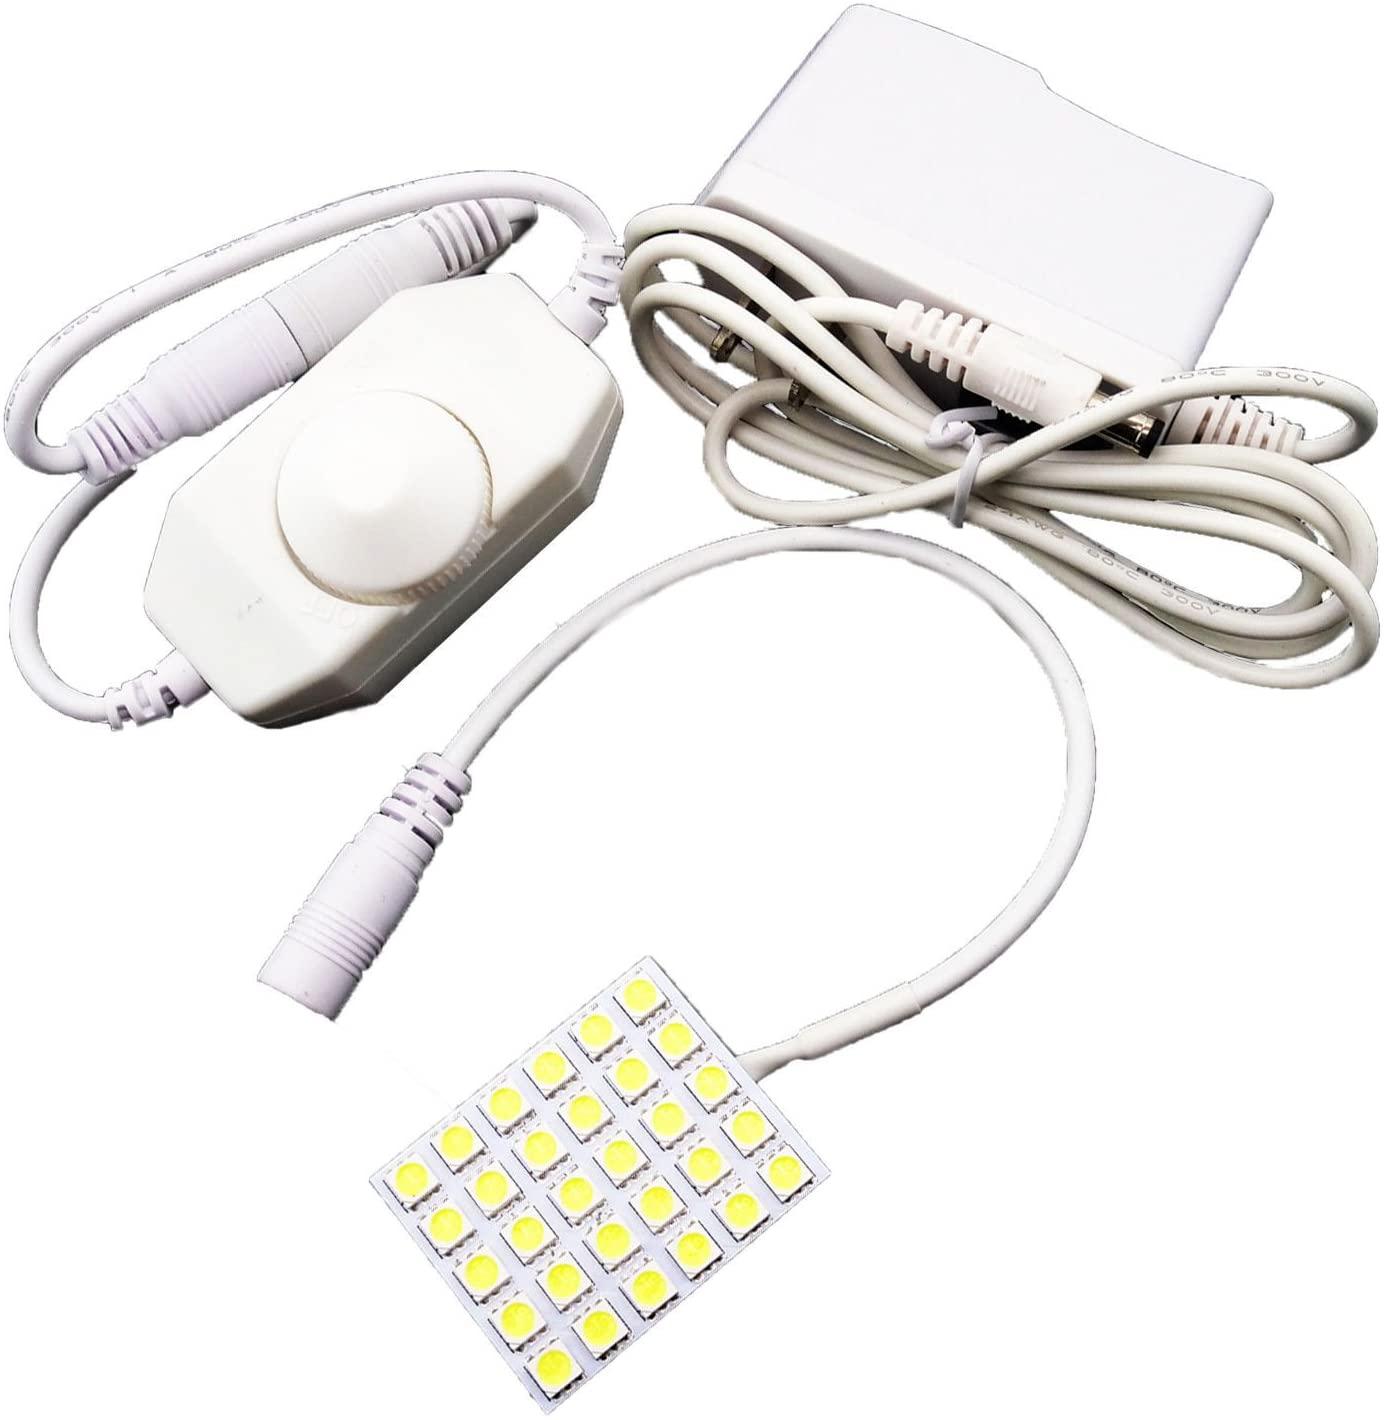 Cutex (TM) Brand Domestic Home Sewing Machine LED Working Light